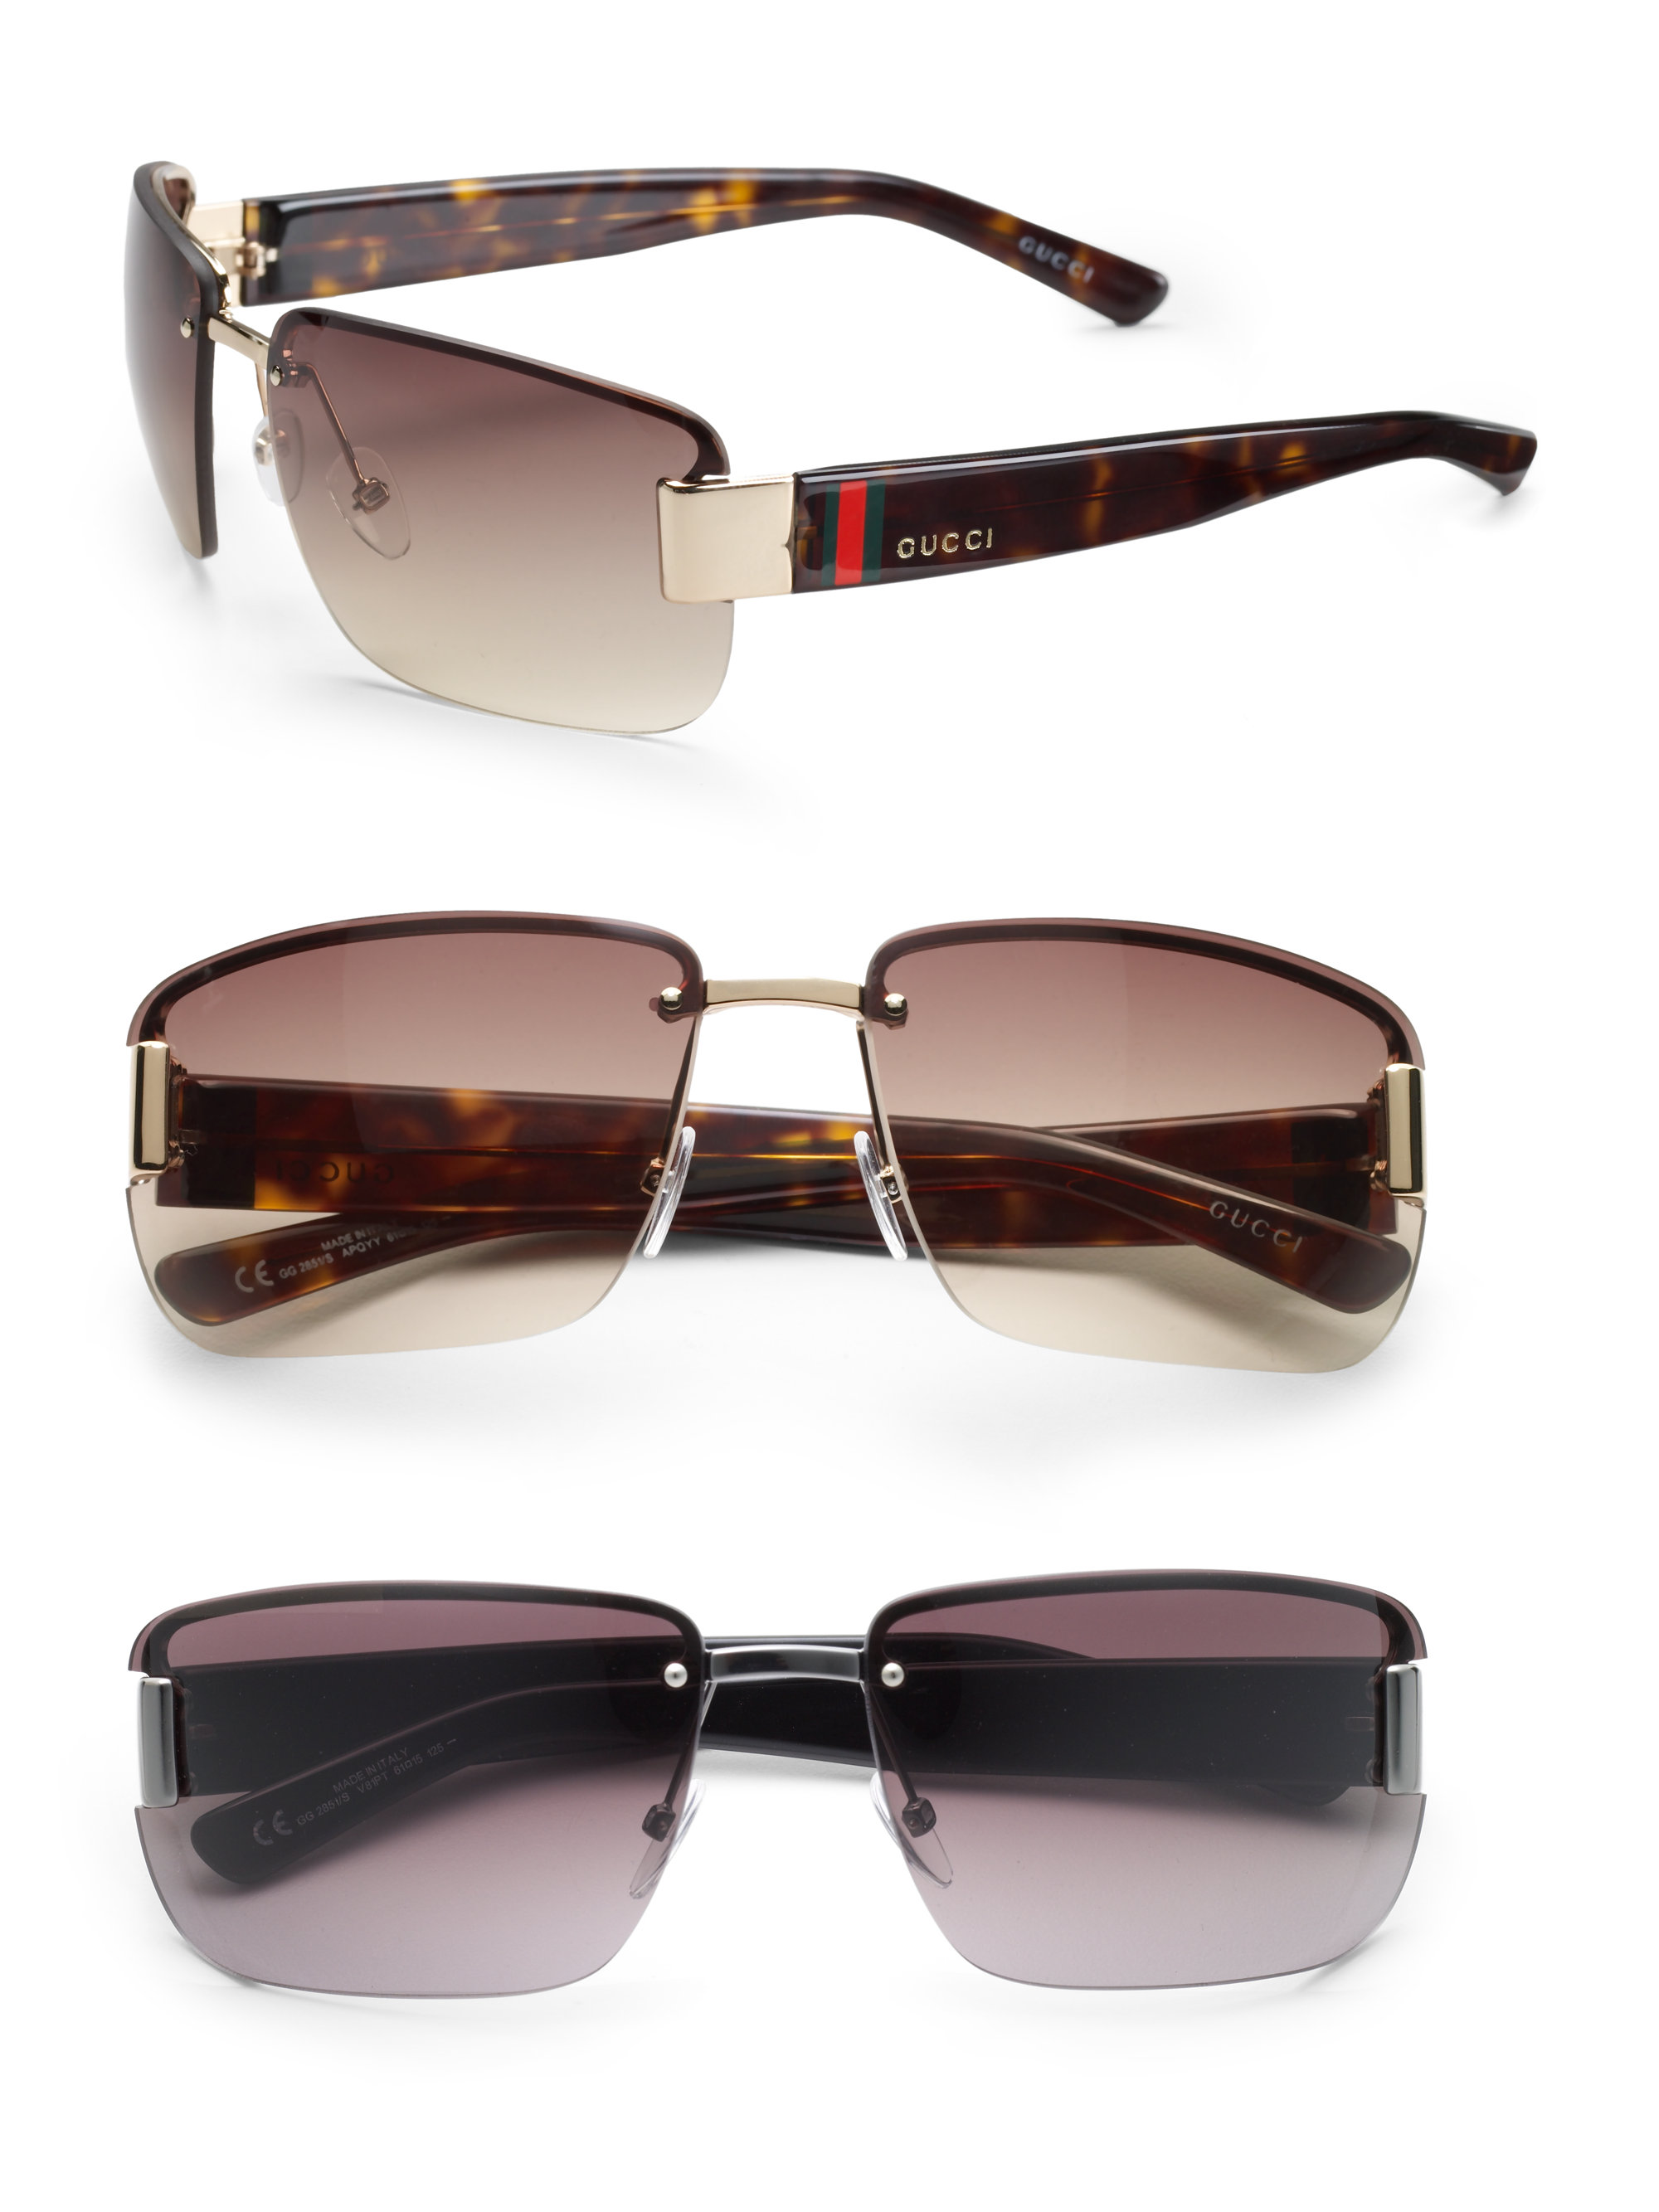 4c662910c75 Lyst - Gucci Rimless Rectangle Sunglasses in Black for Men